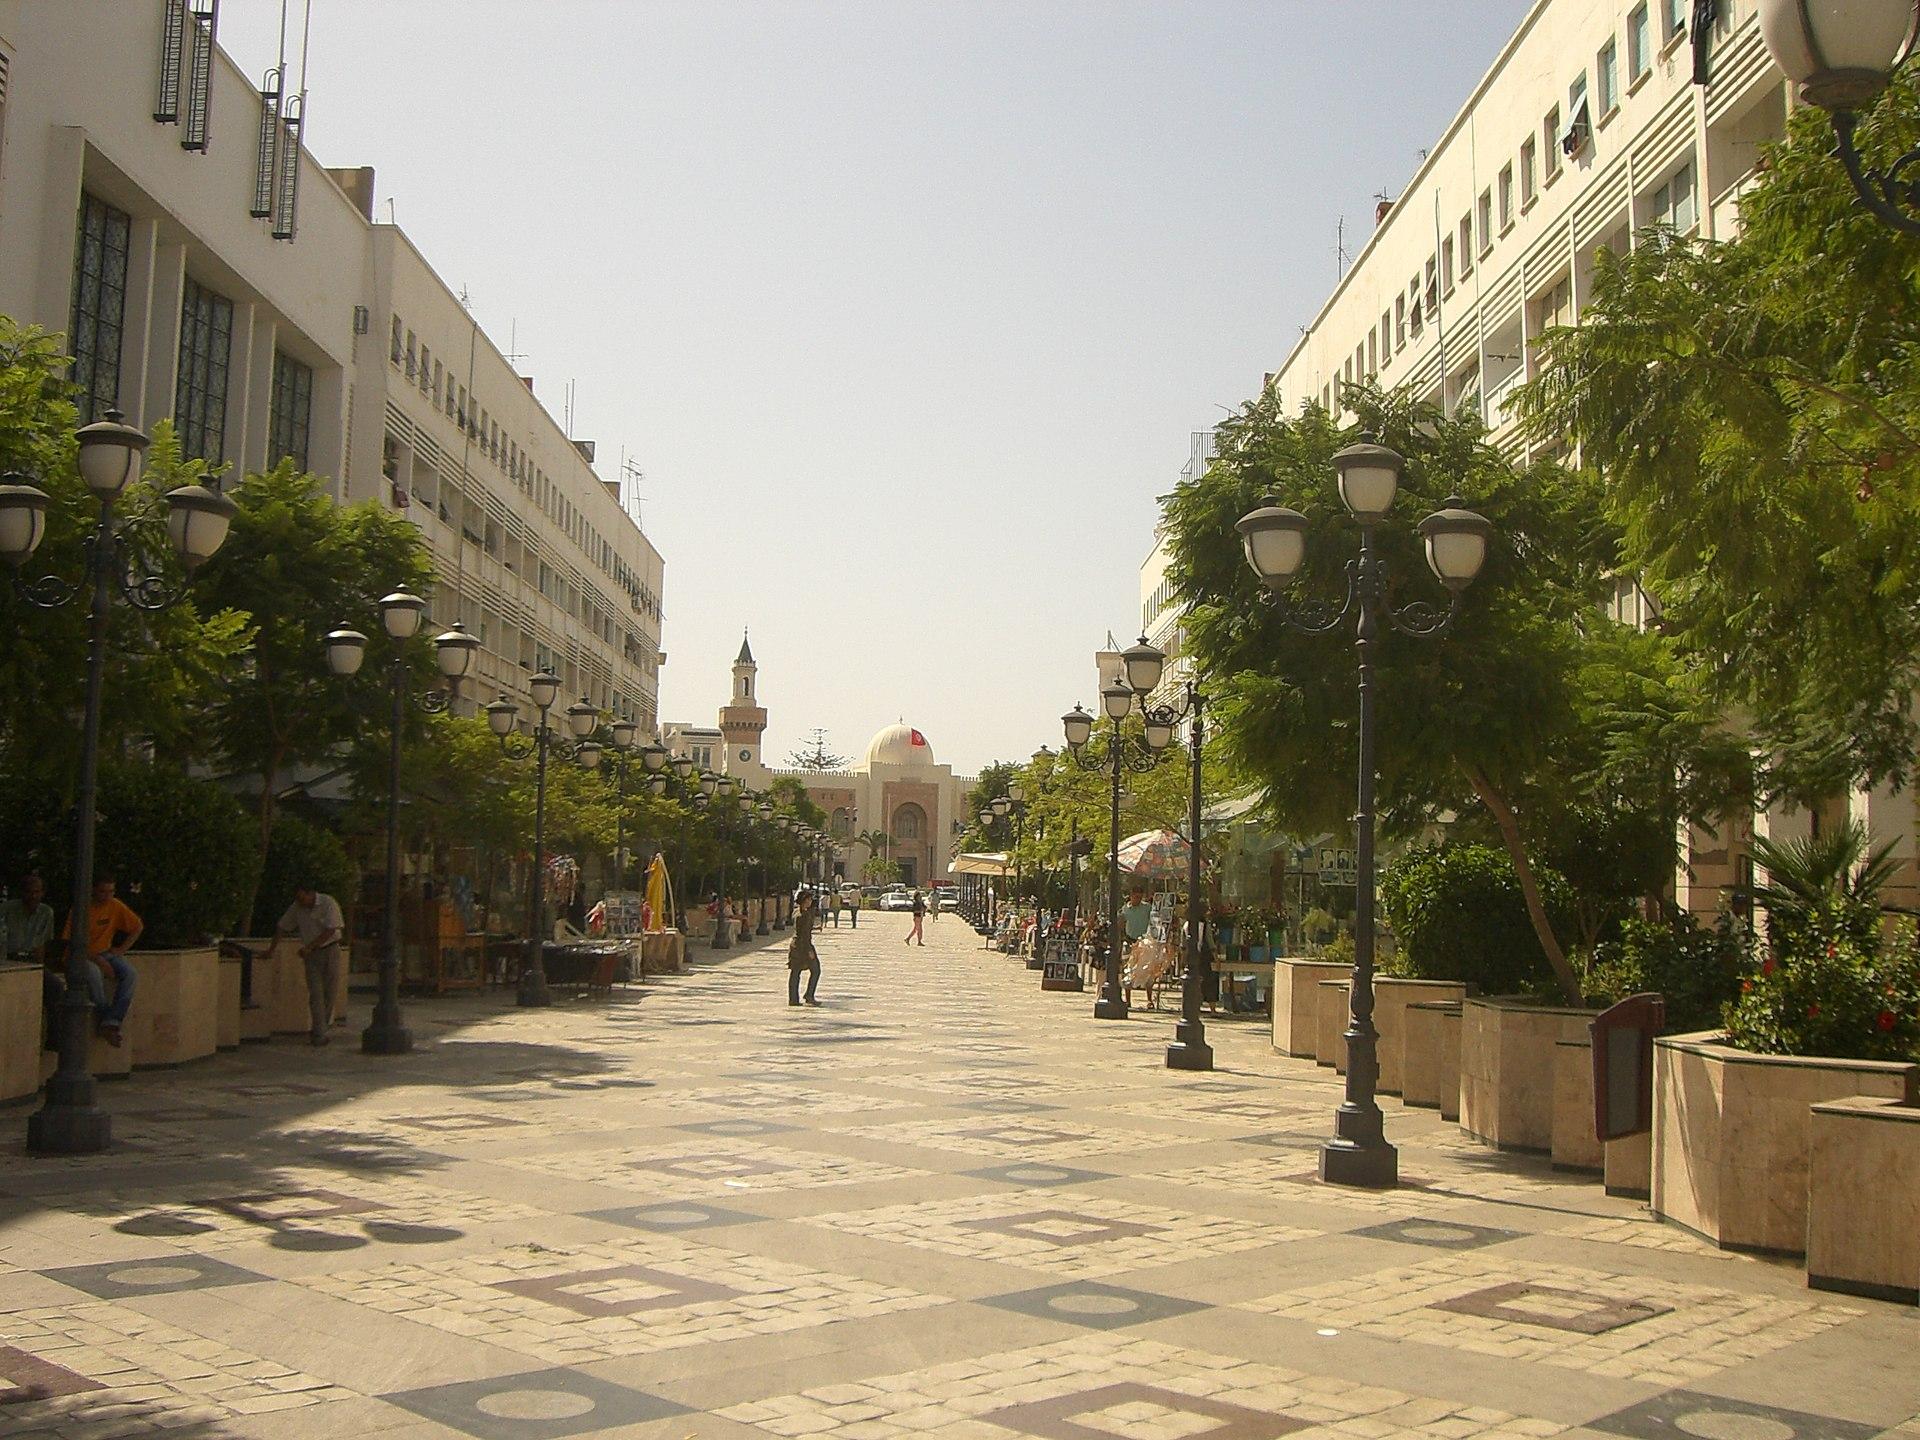 Sfax - Wikipedia